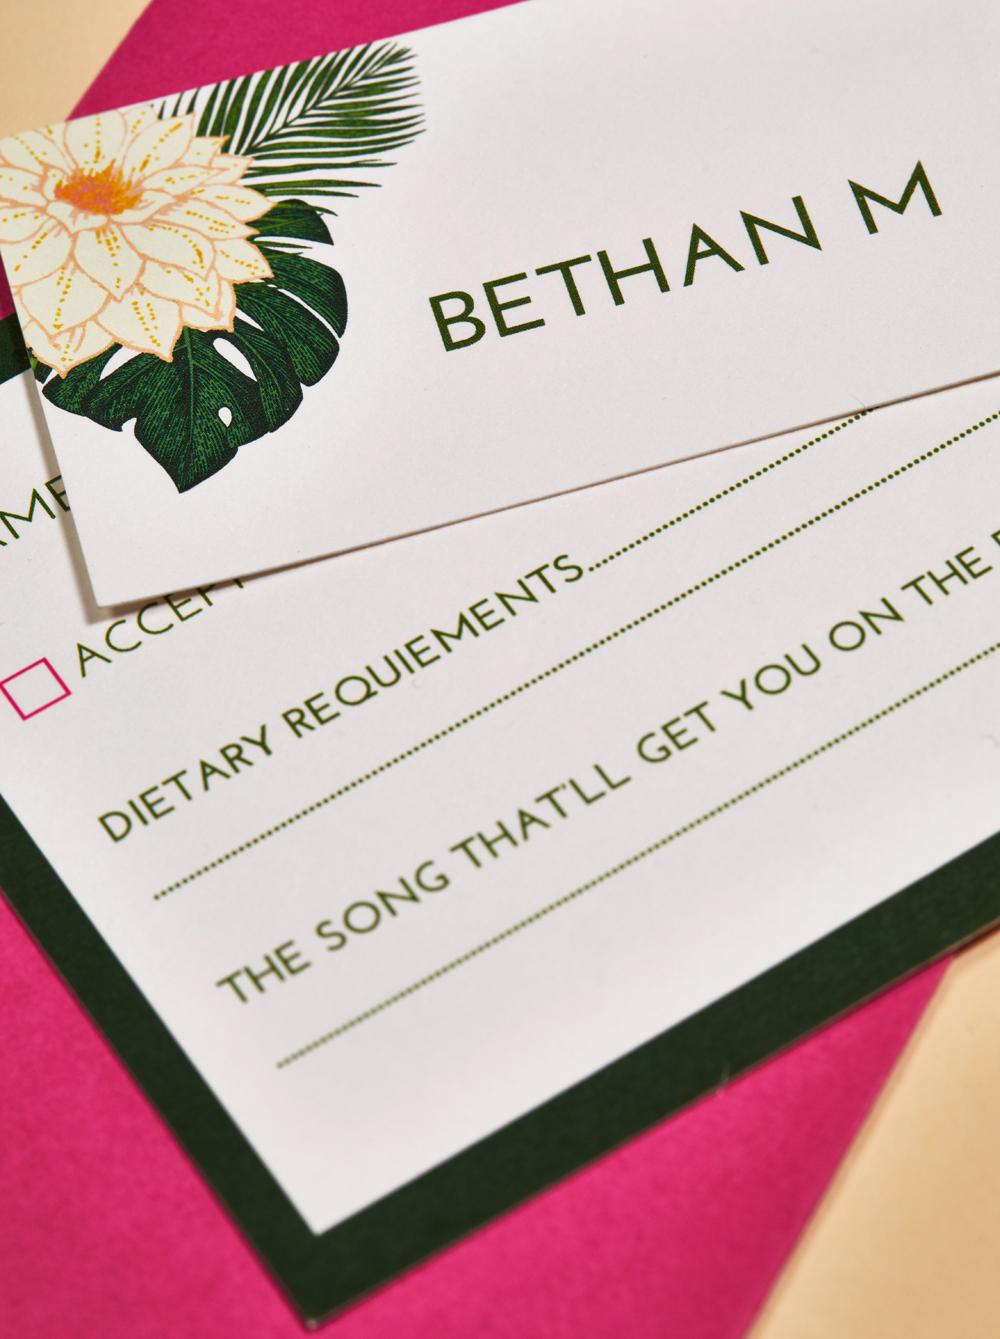 Beattie and Sam's bespoke wedding stationery